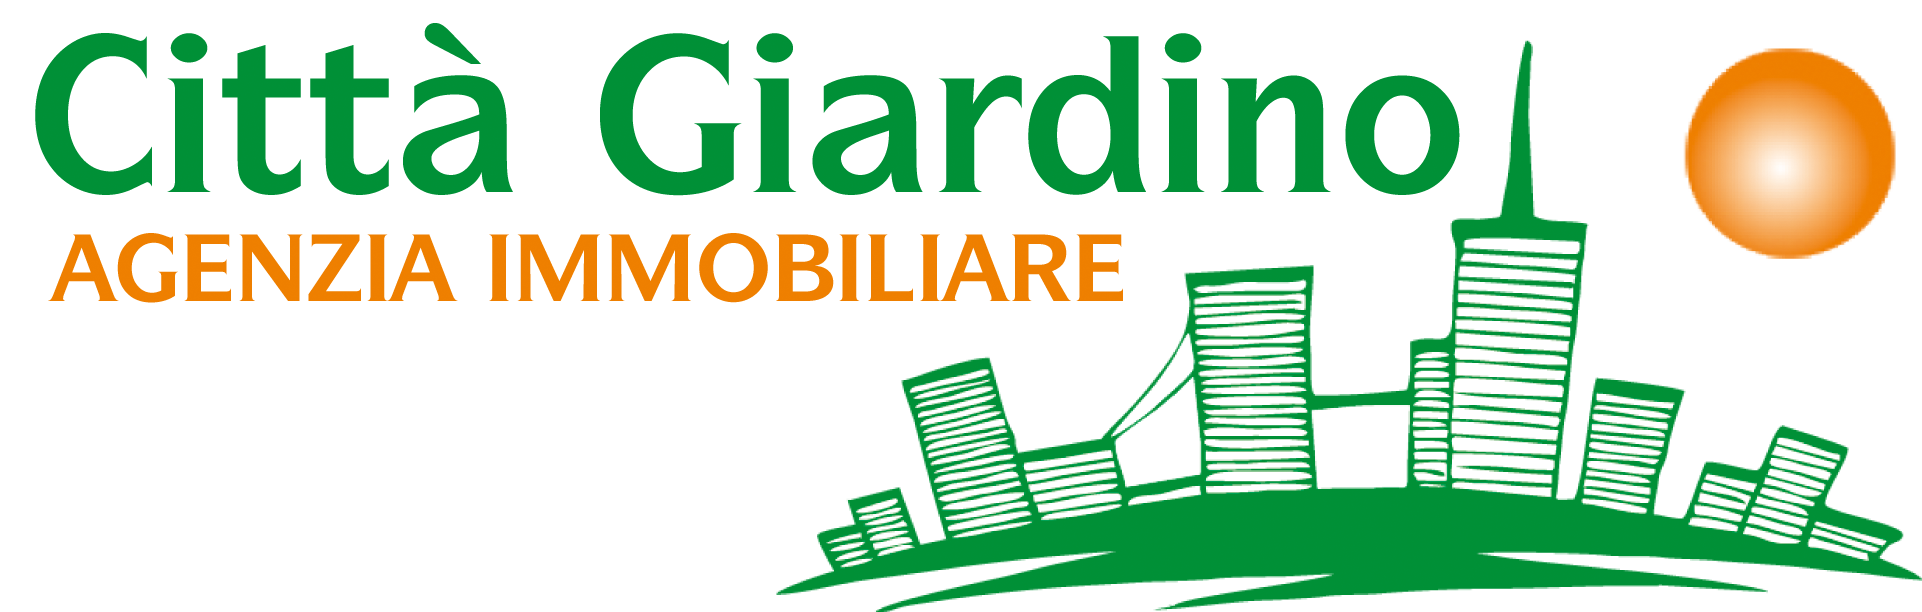 logo CITTA' GIARDINO Immobiliare